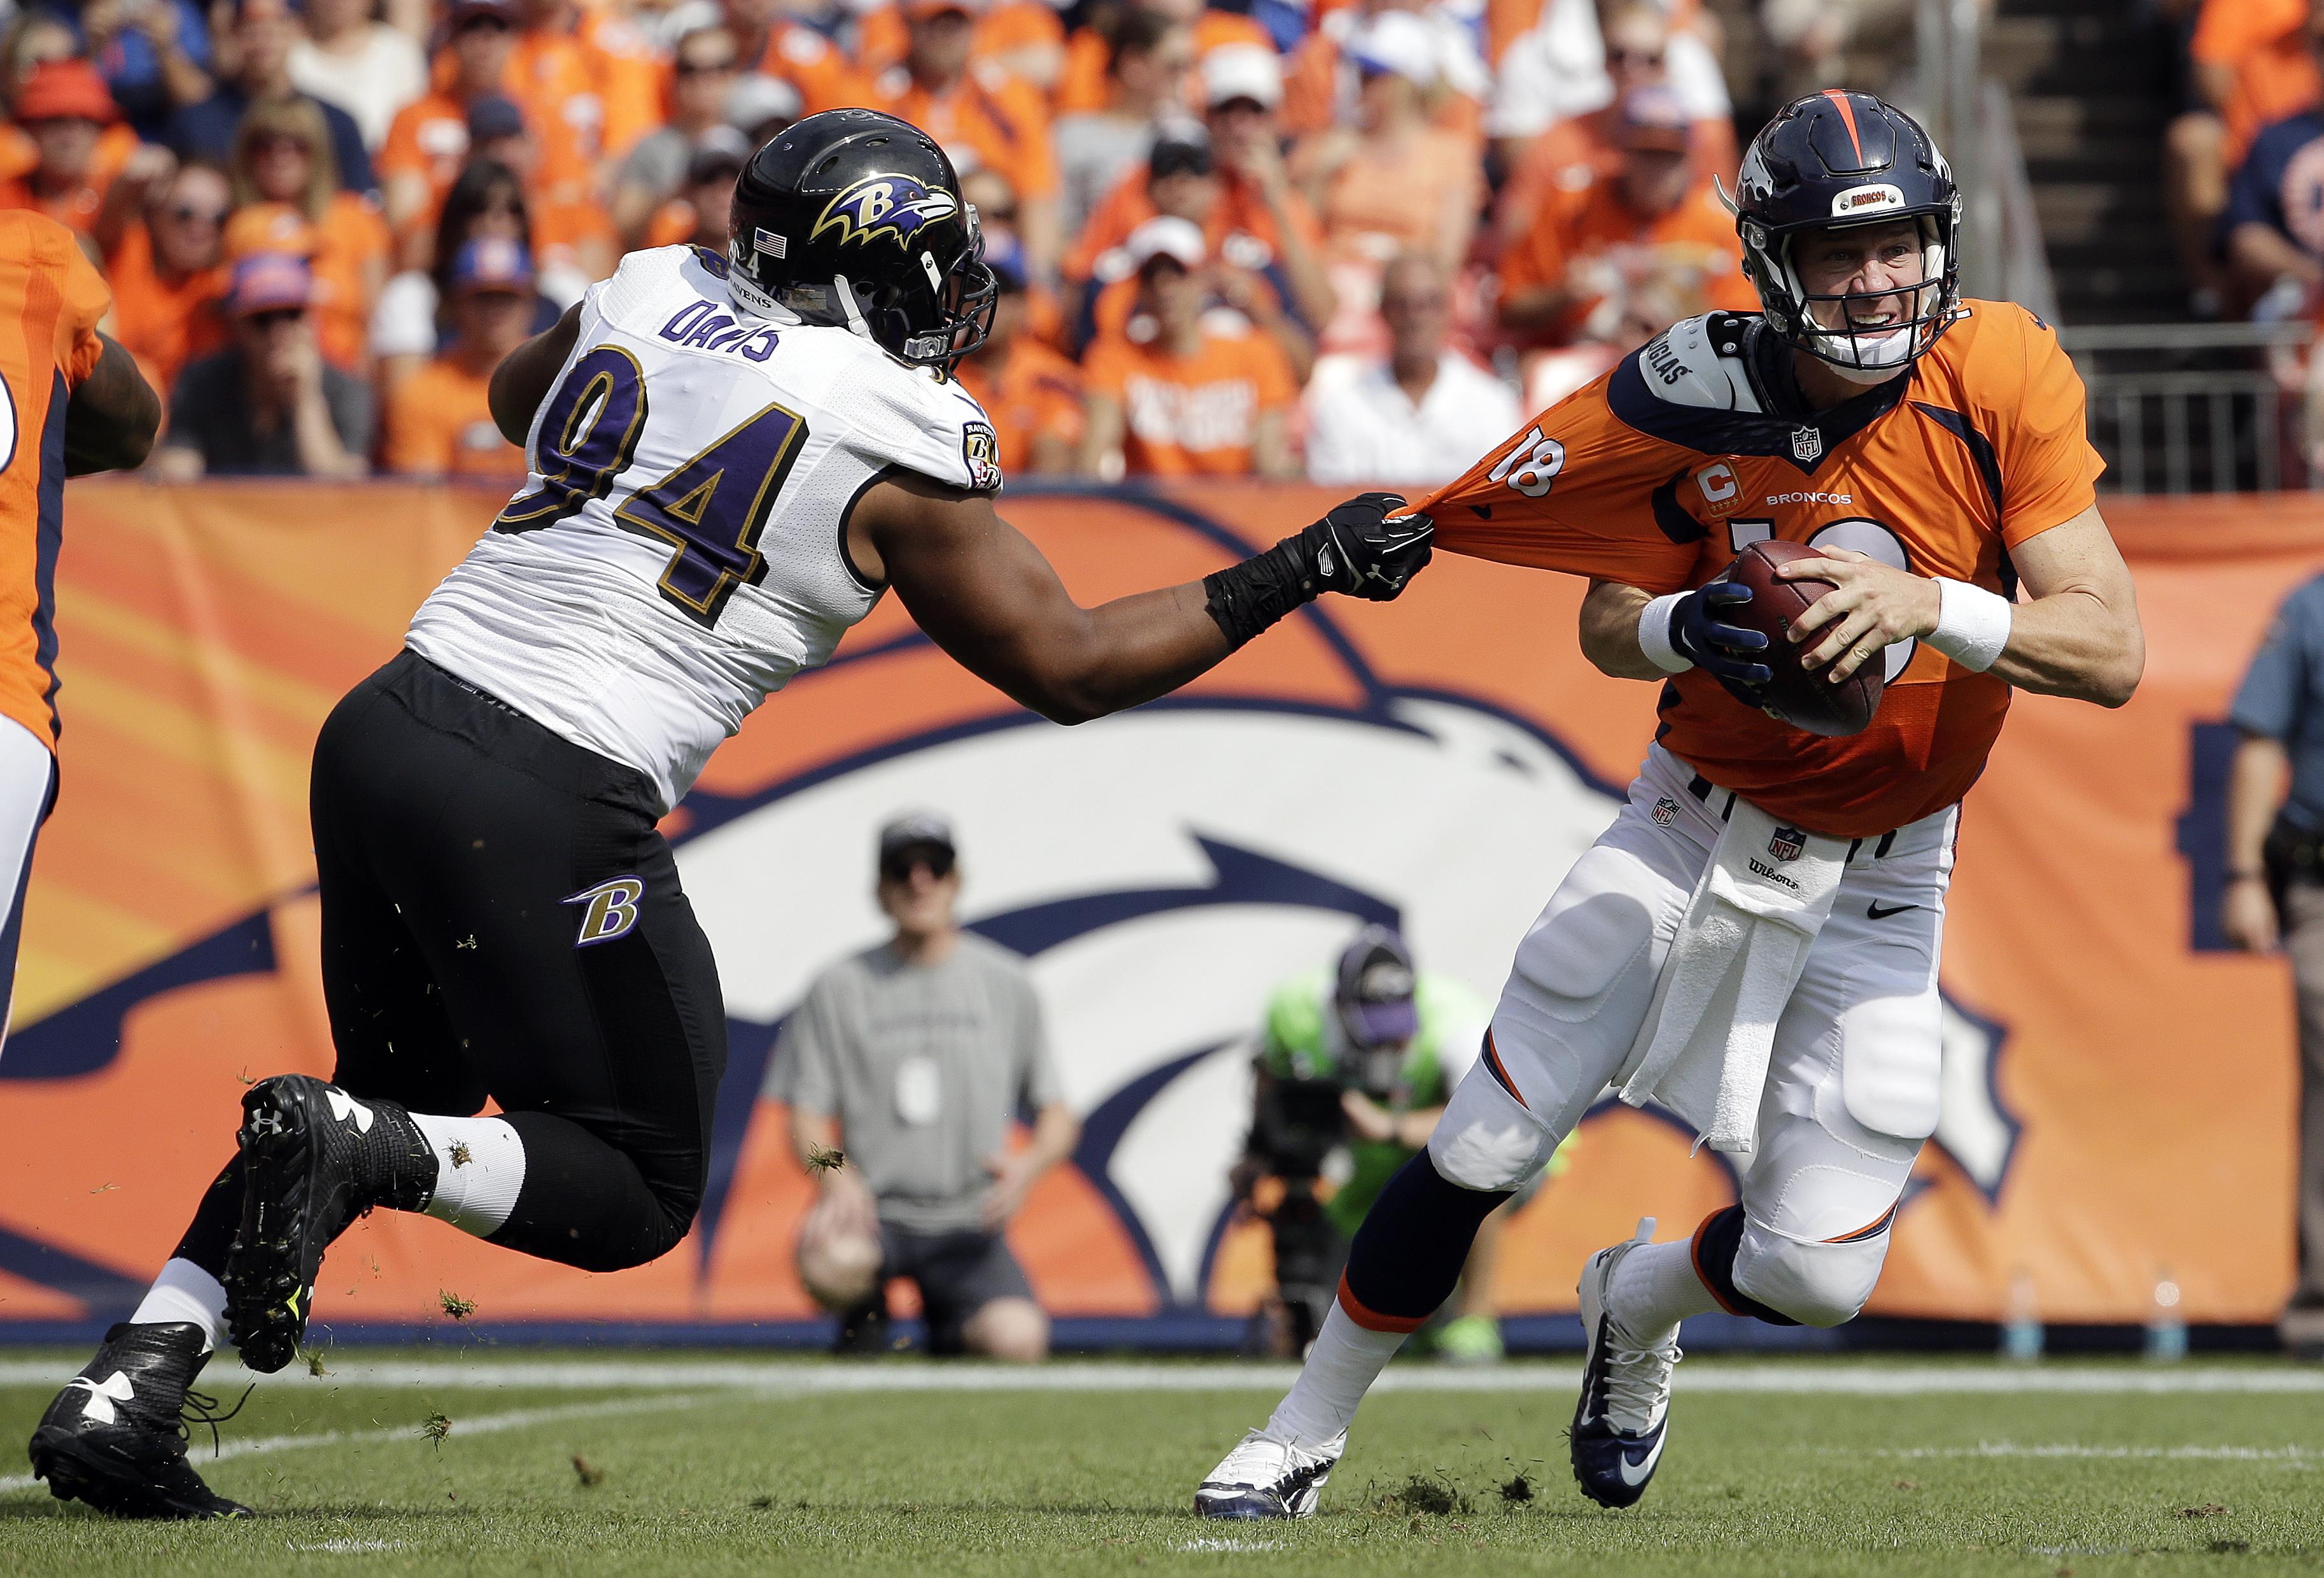 Baltimore Ravens defensive tackle Carl Davis, left, pulls on the jersey of Denver Broncos quarterback Peyton Manning during the first half of an NFL football game Sunday, Sept. 13, 2015, in Denver. (AP Photo/Jack Dempsey)